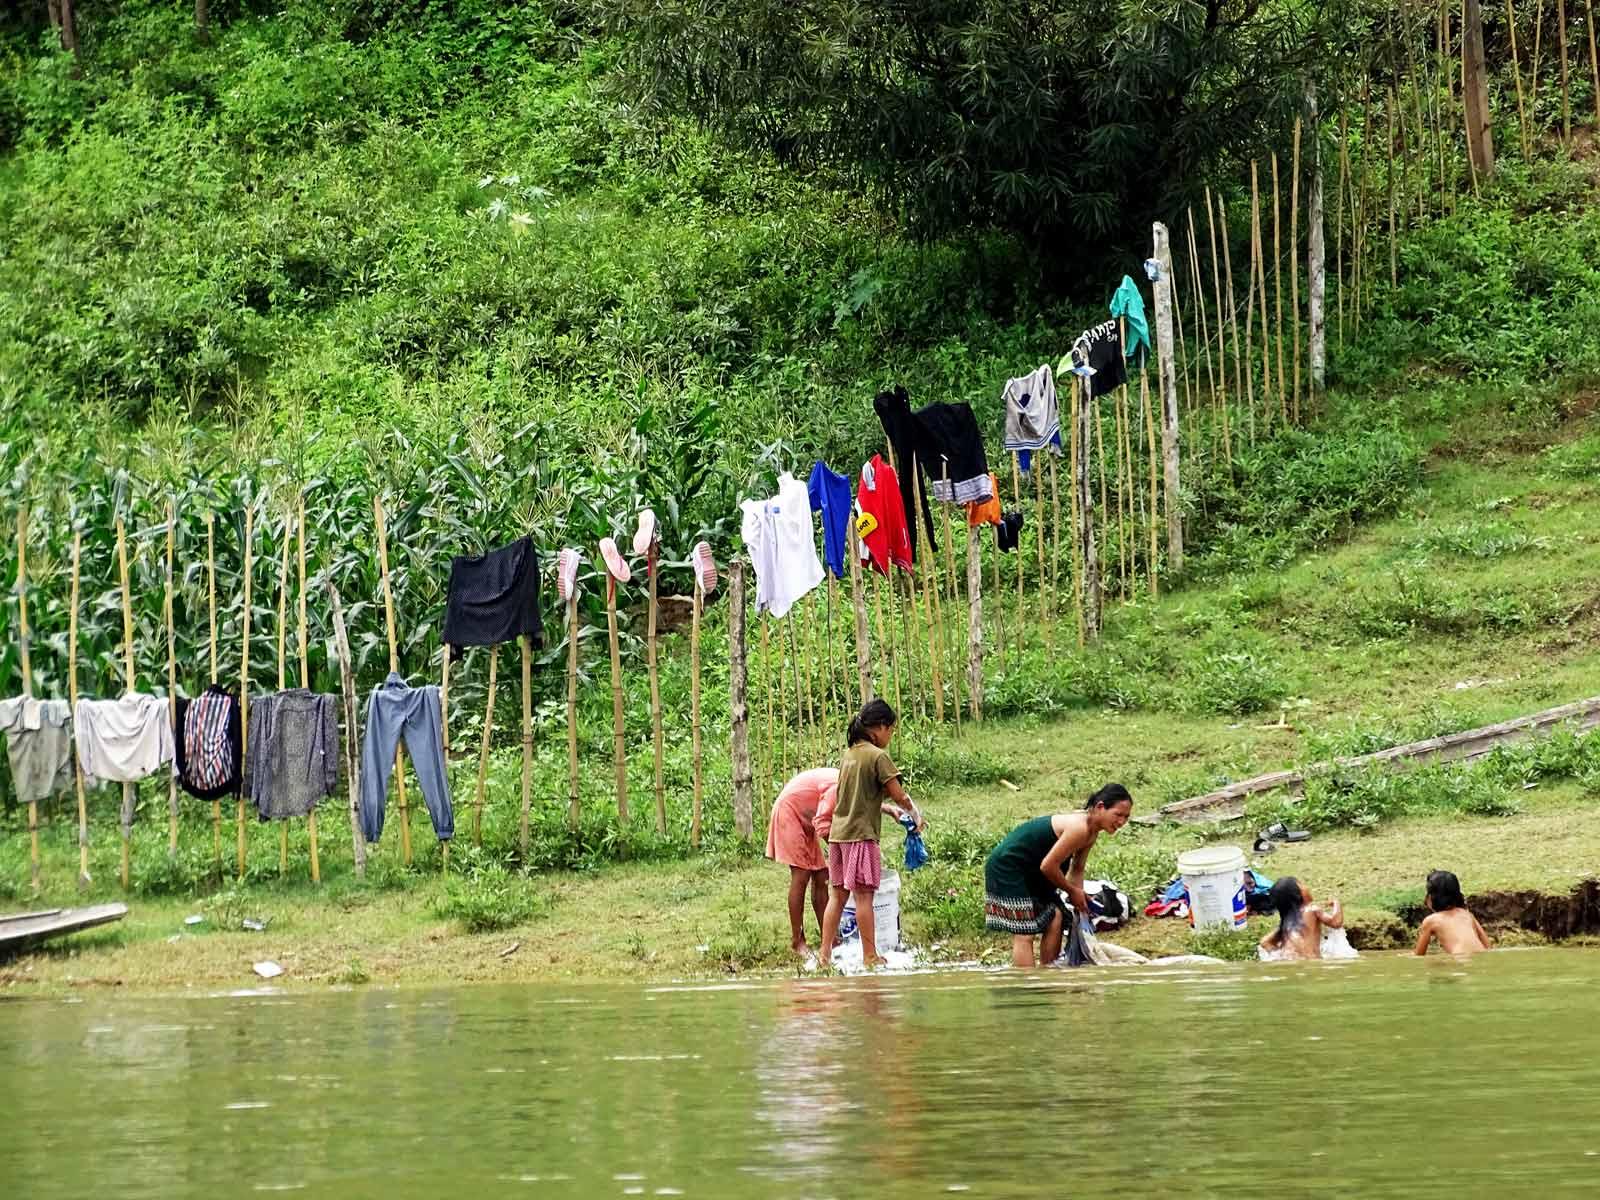 rondreis laos boottocht mekong rivier hoogtepunt 6